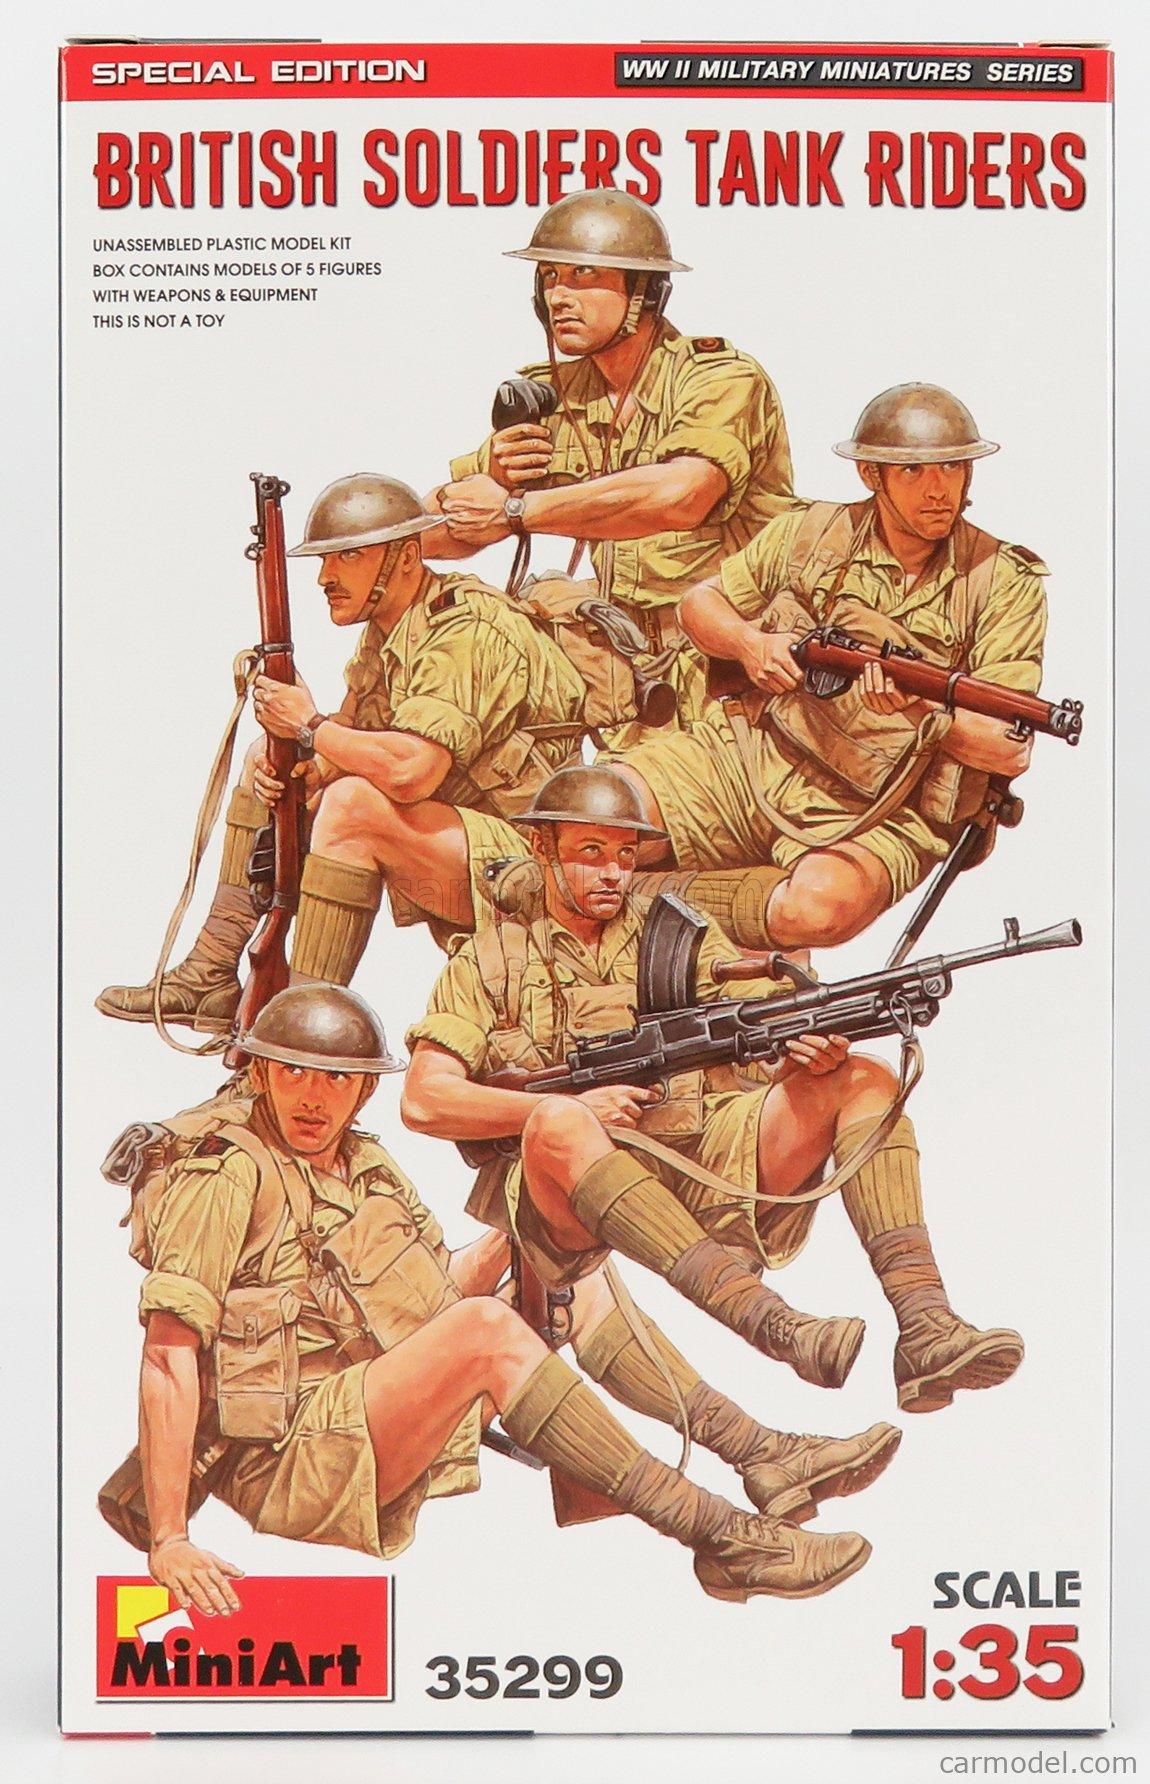 MINIART 35299 Scale 1/35  FIGURES SOLDATI - BRITISH SOLDIERS MILITARY TANK RIDERS /